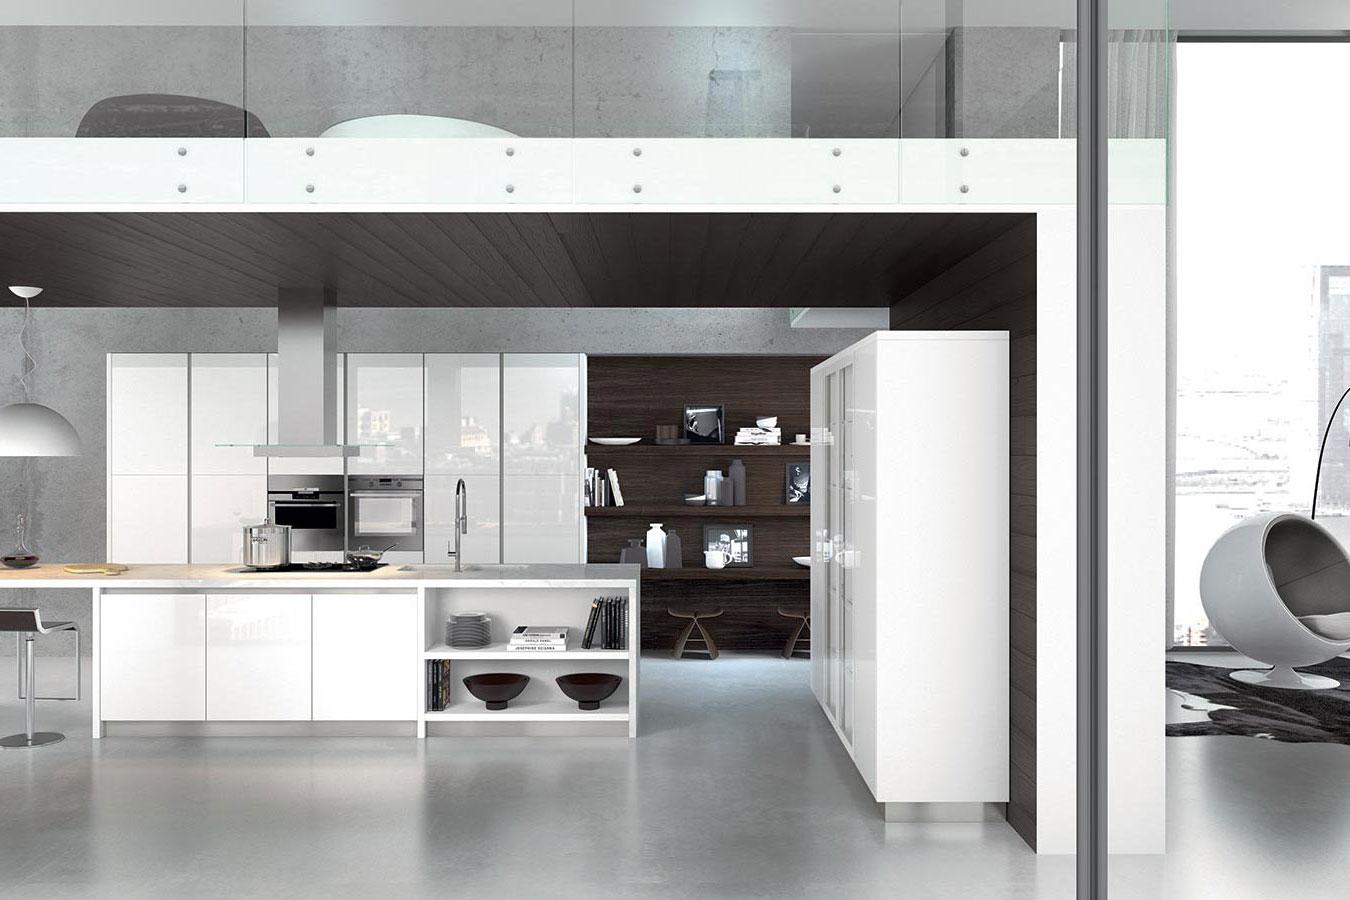 Cucina moderna bianca: come renderla unica. - Righetti Mobili Novara